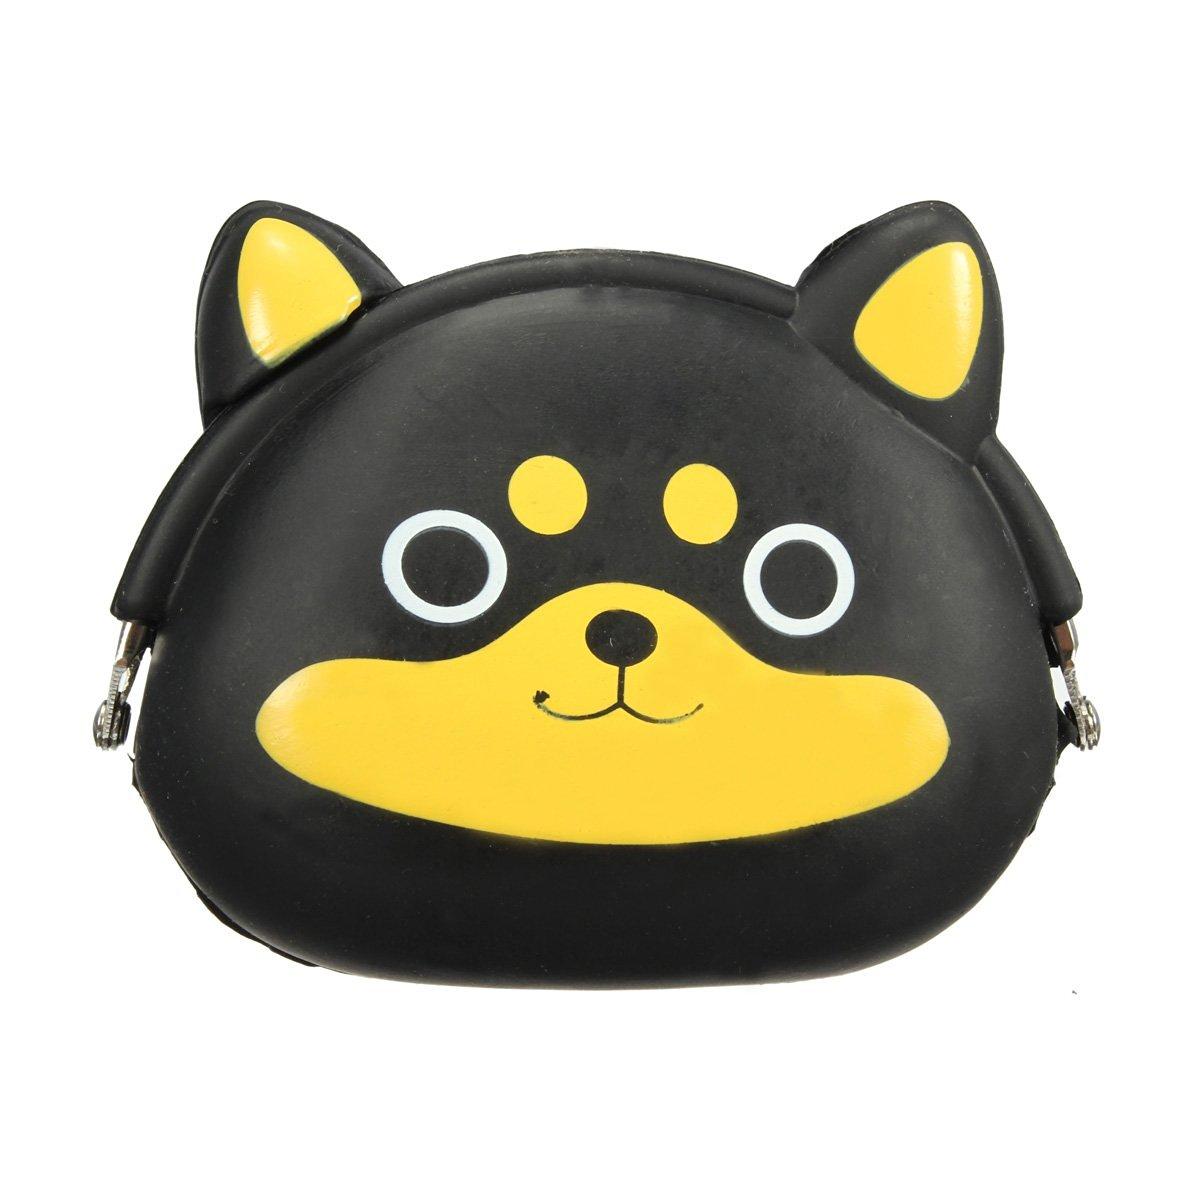 TFTP-Women Girls Wallet Kawaii Cute Cartoon Animal Silicone Jelly Coin Bag Purse Kids Gift Huskies